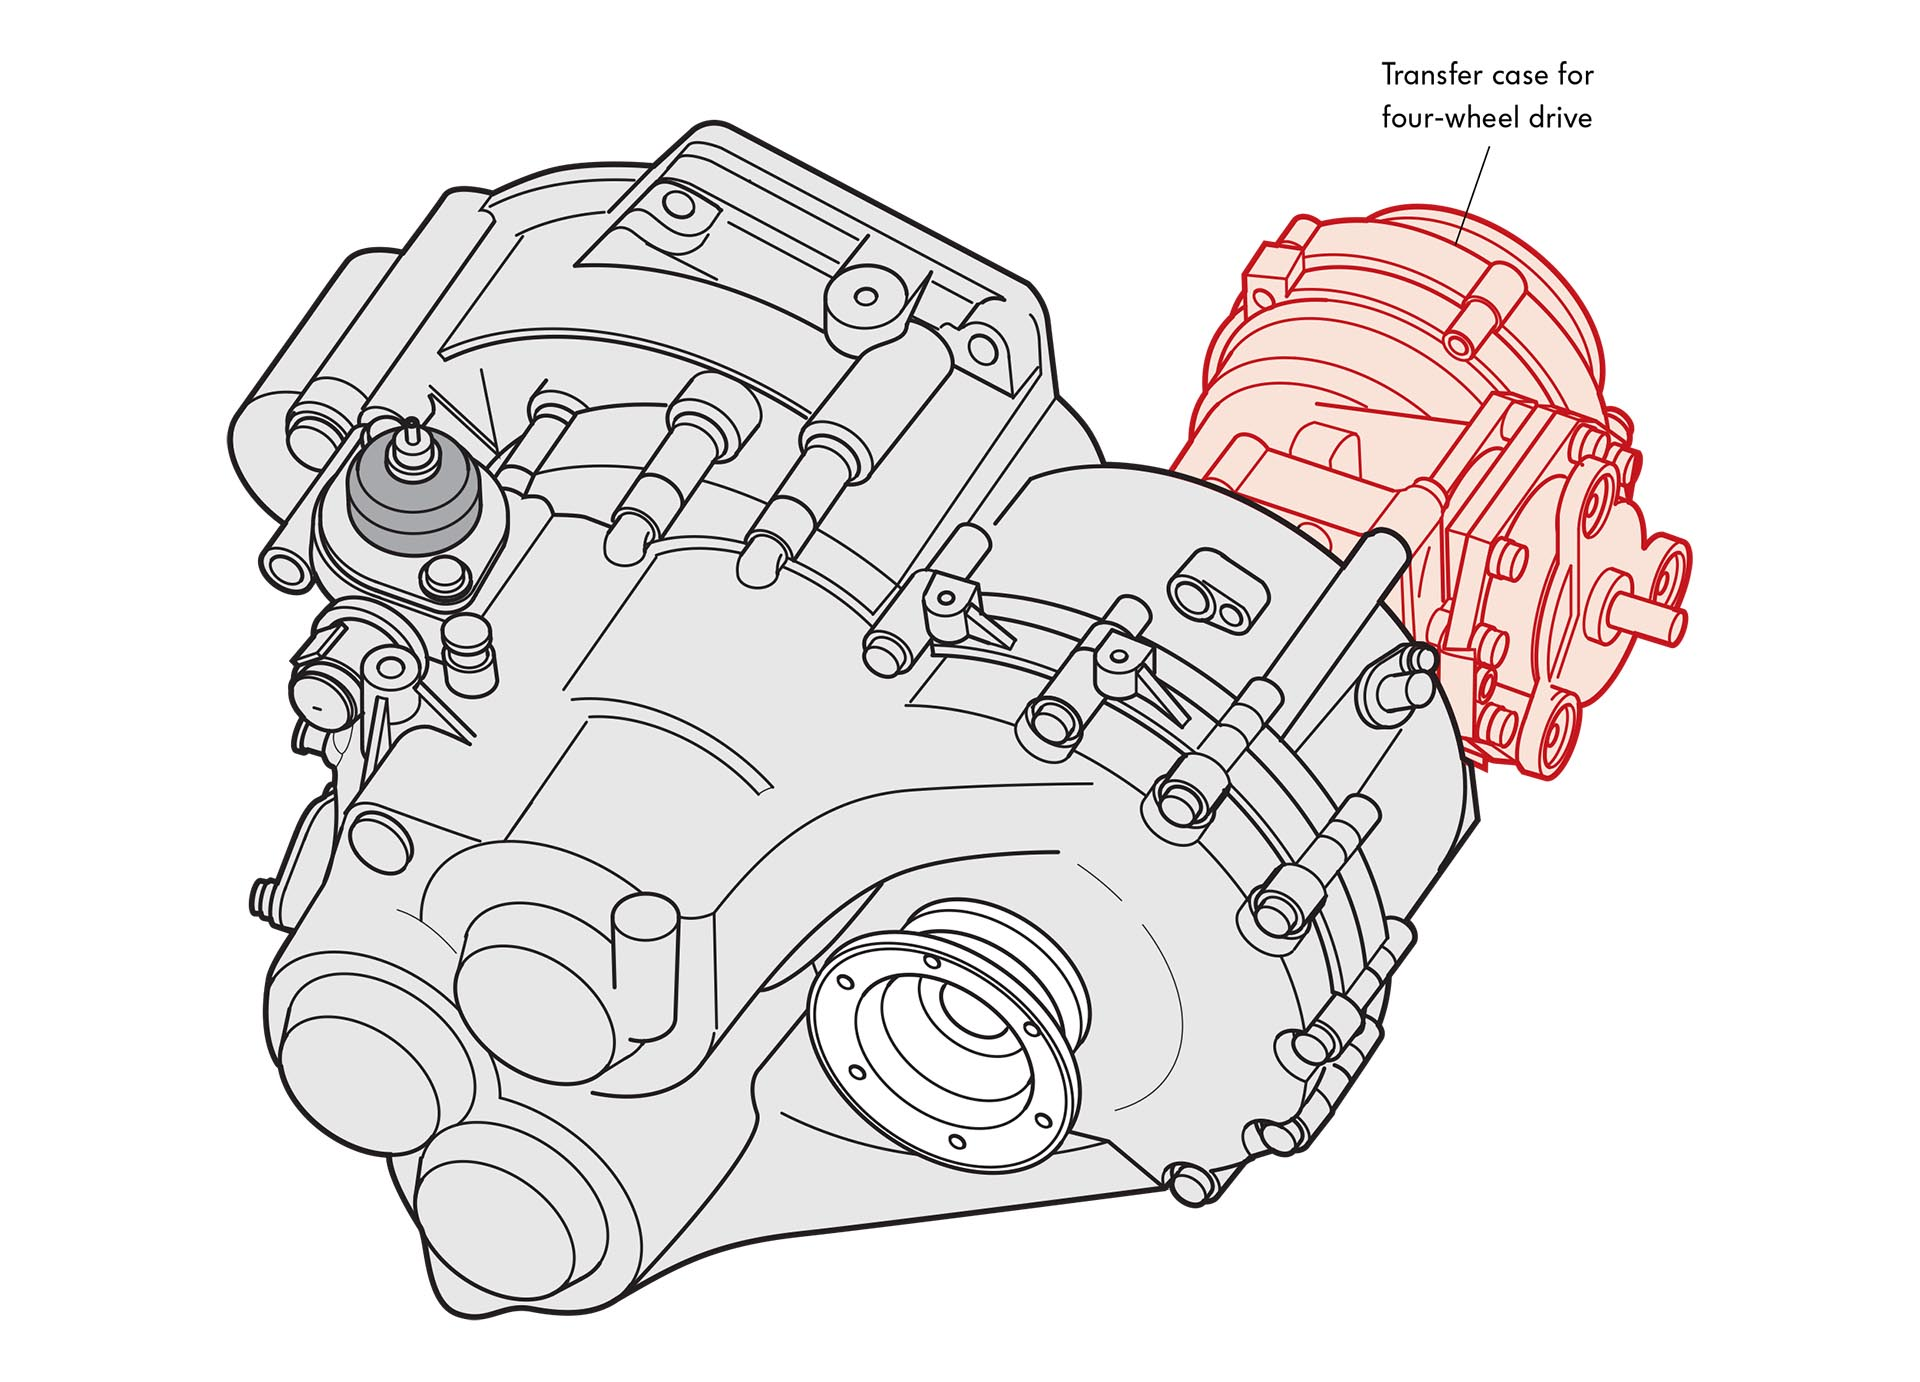 01_VW 02M 4MOTION 6-speed transmission drawing